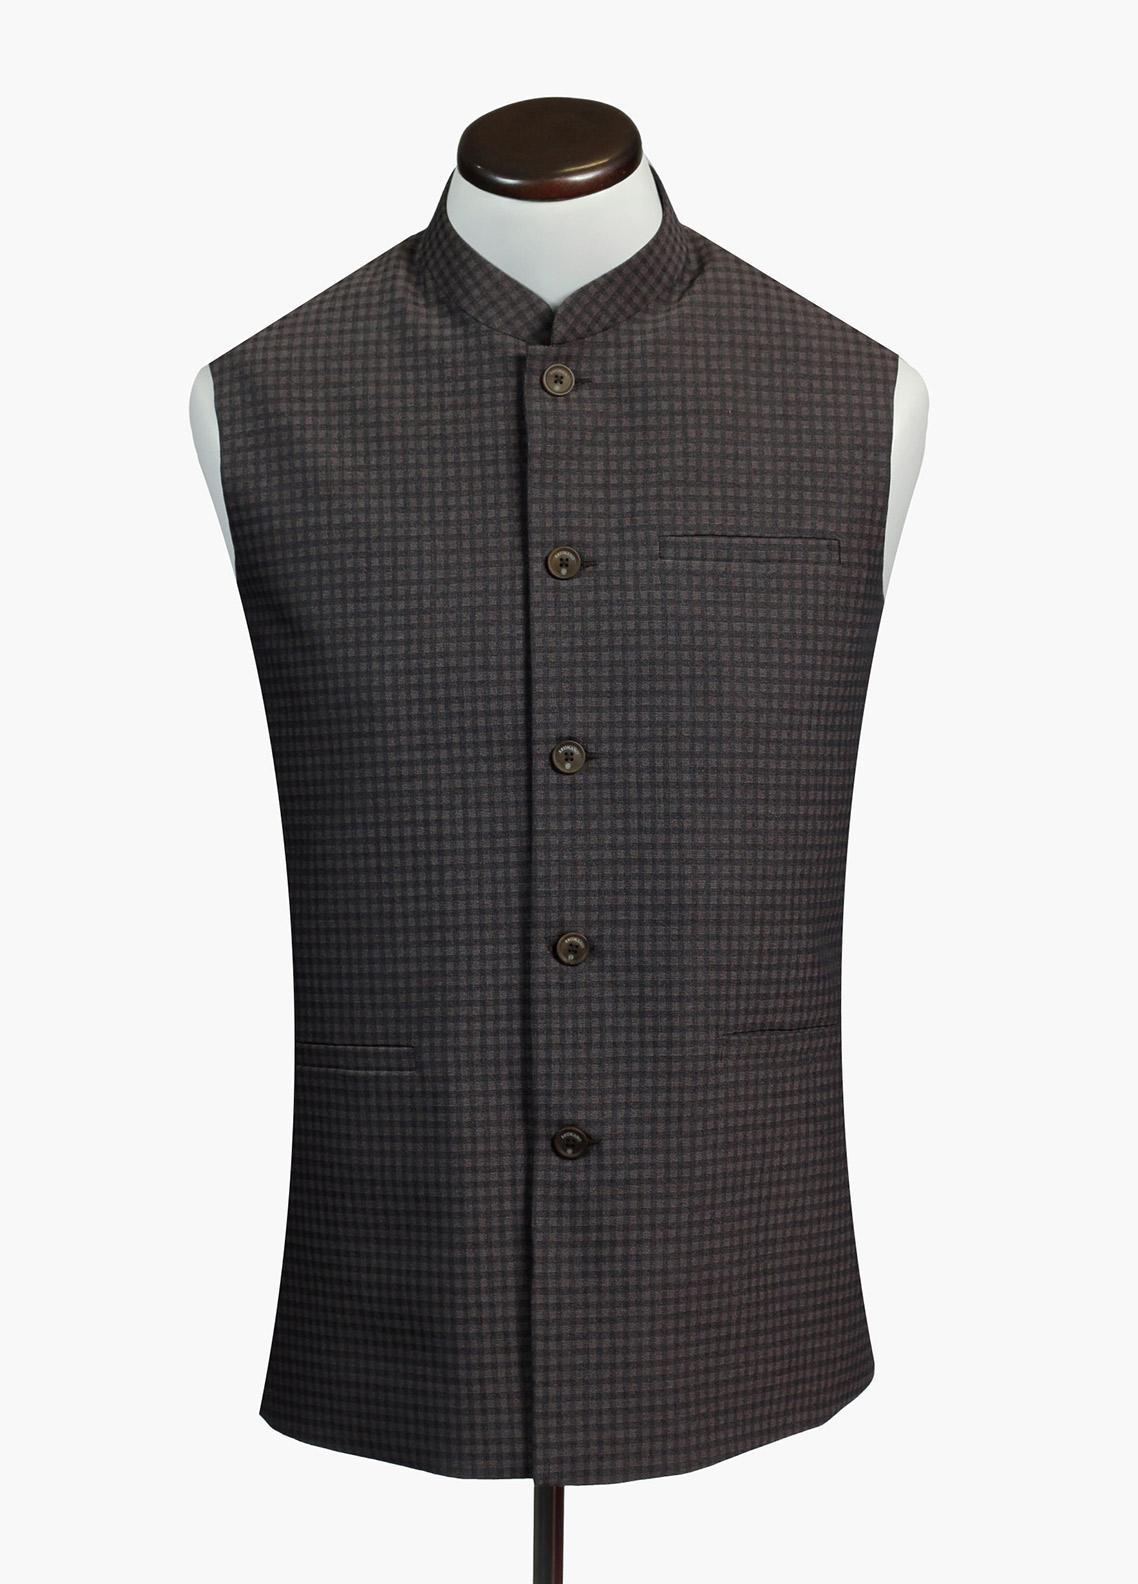 Brumano Cotton Formal Waistcoat for Men - Grey BRM-488